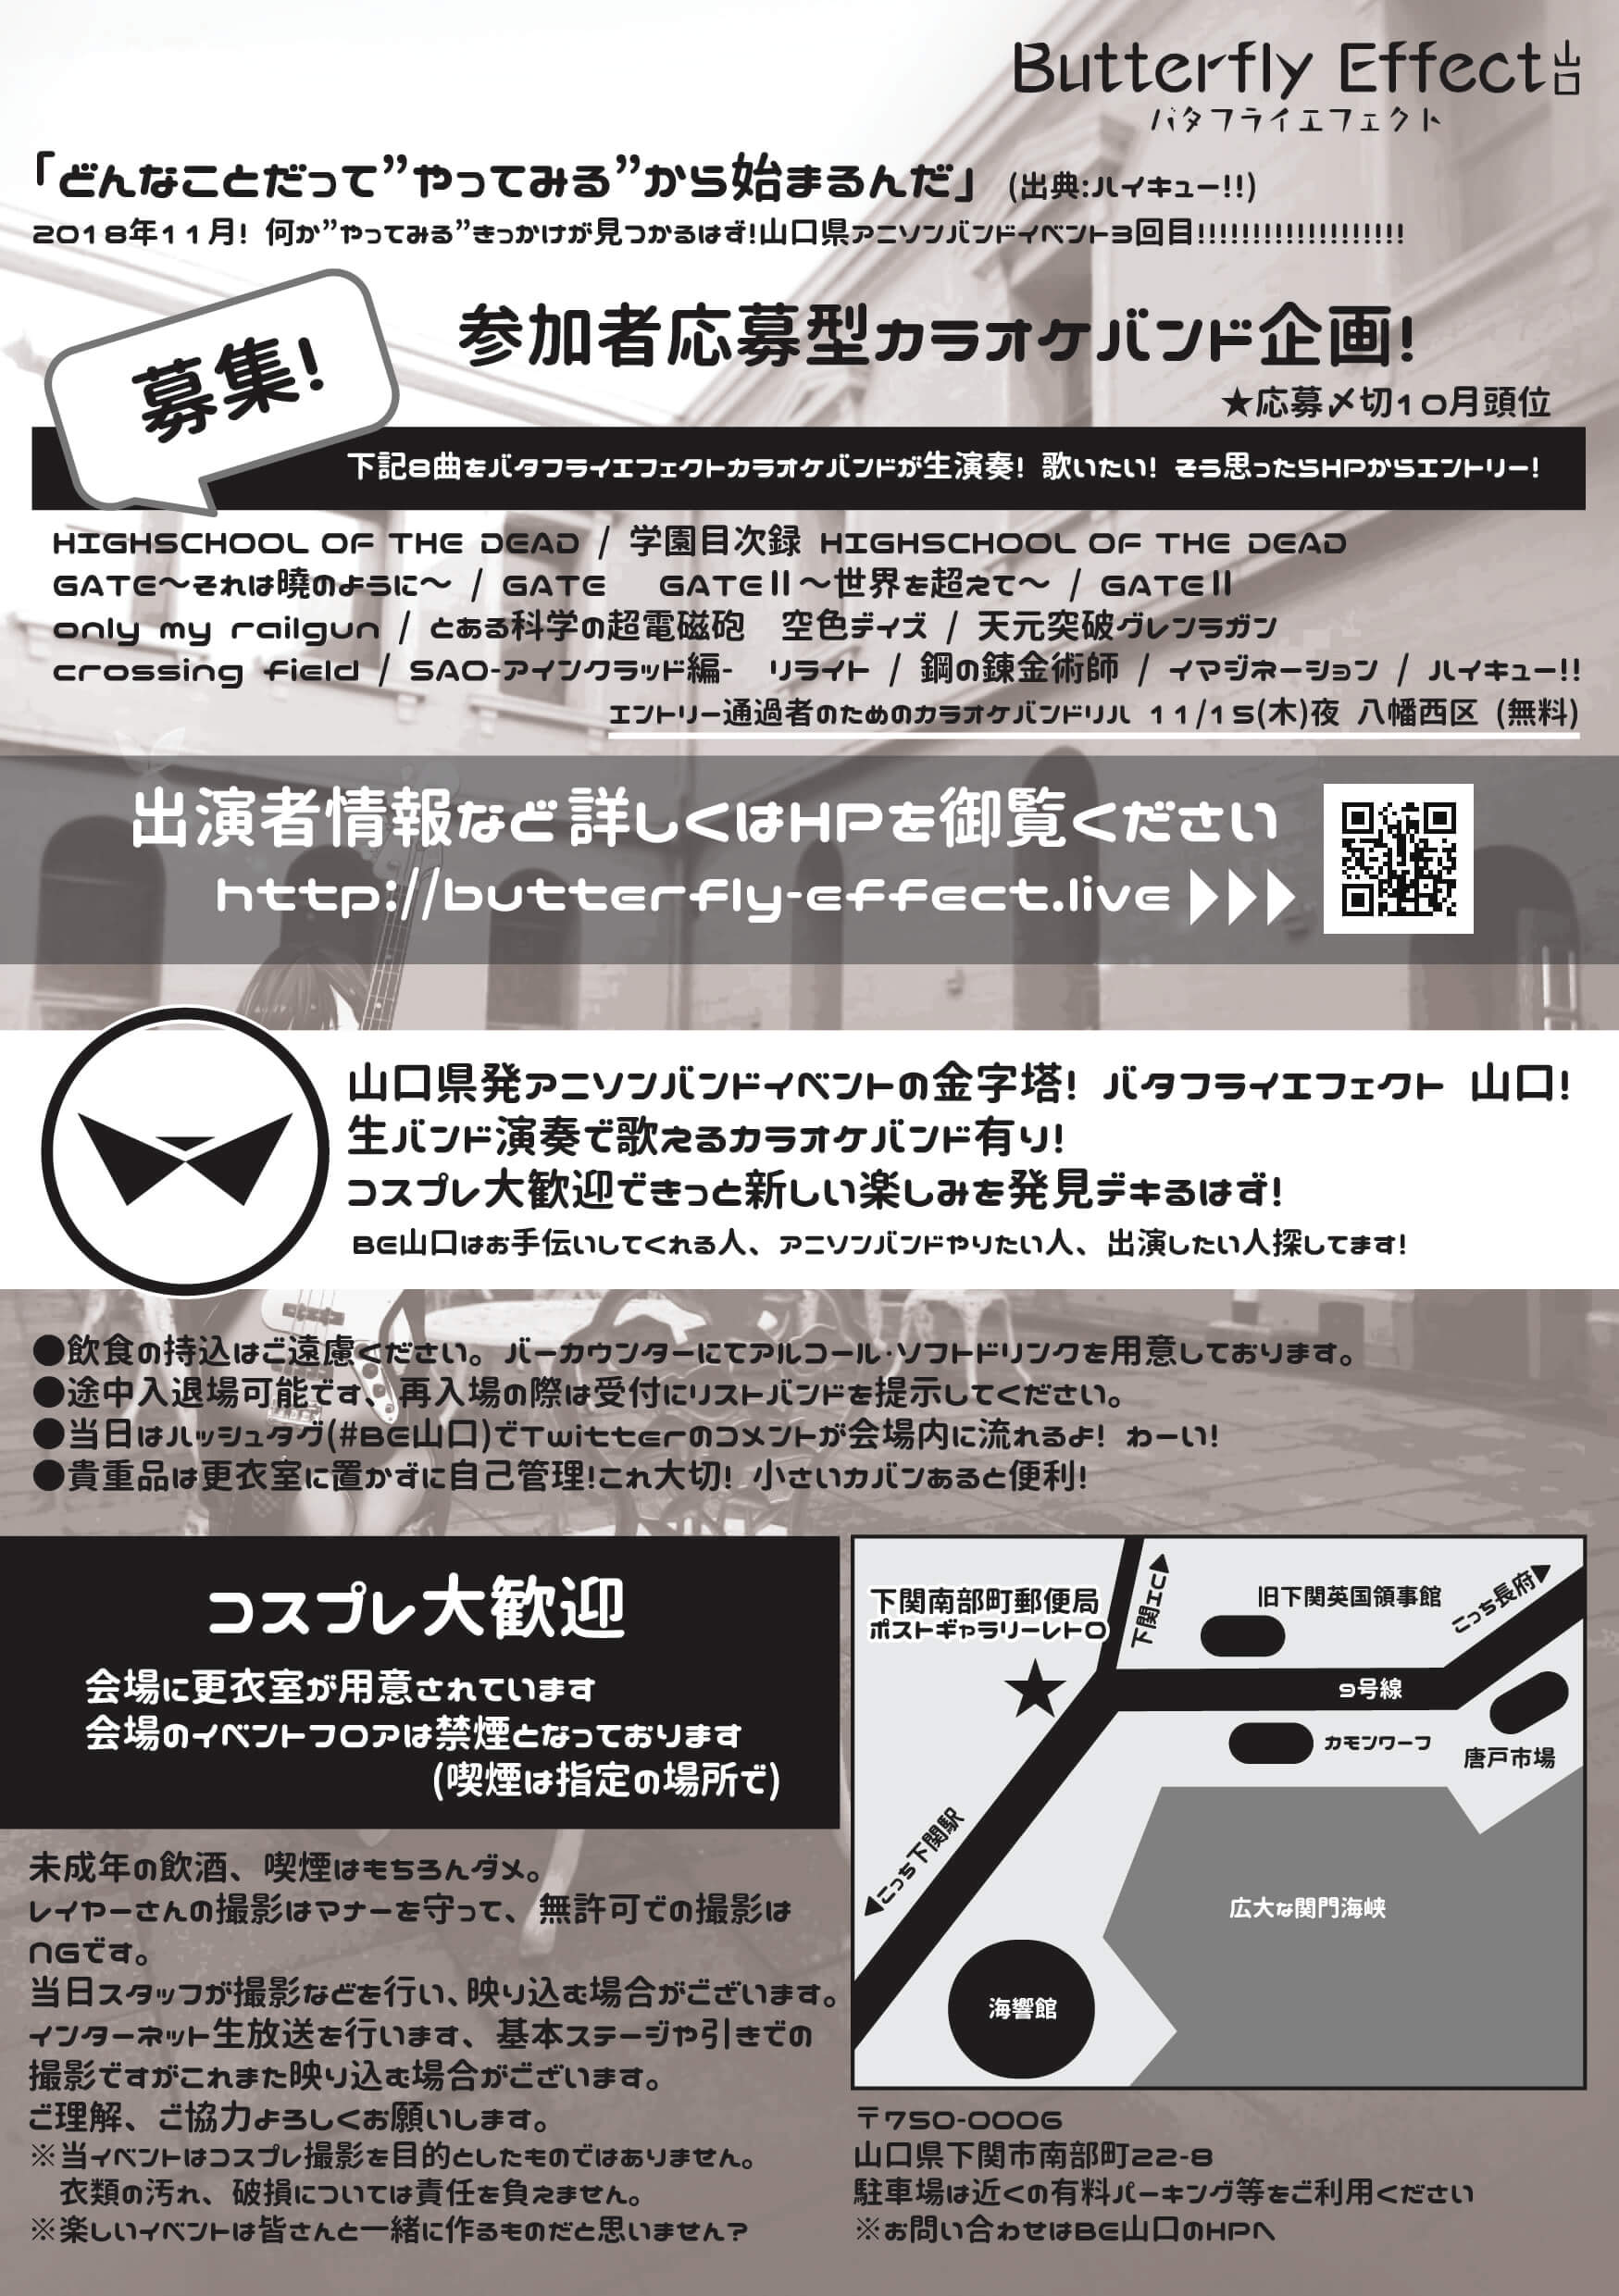 Butterfly Effect 山口 Vol.3フライヤー うら